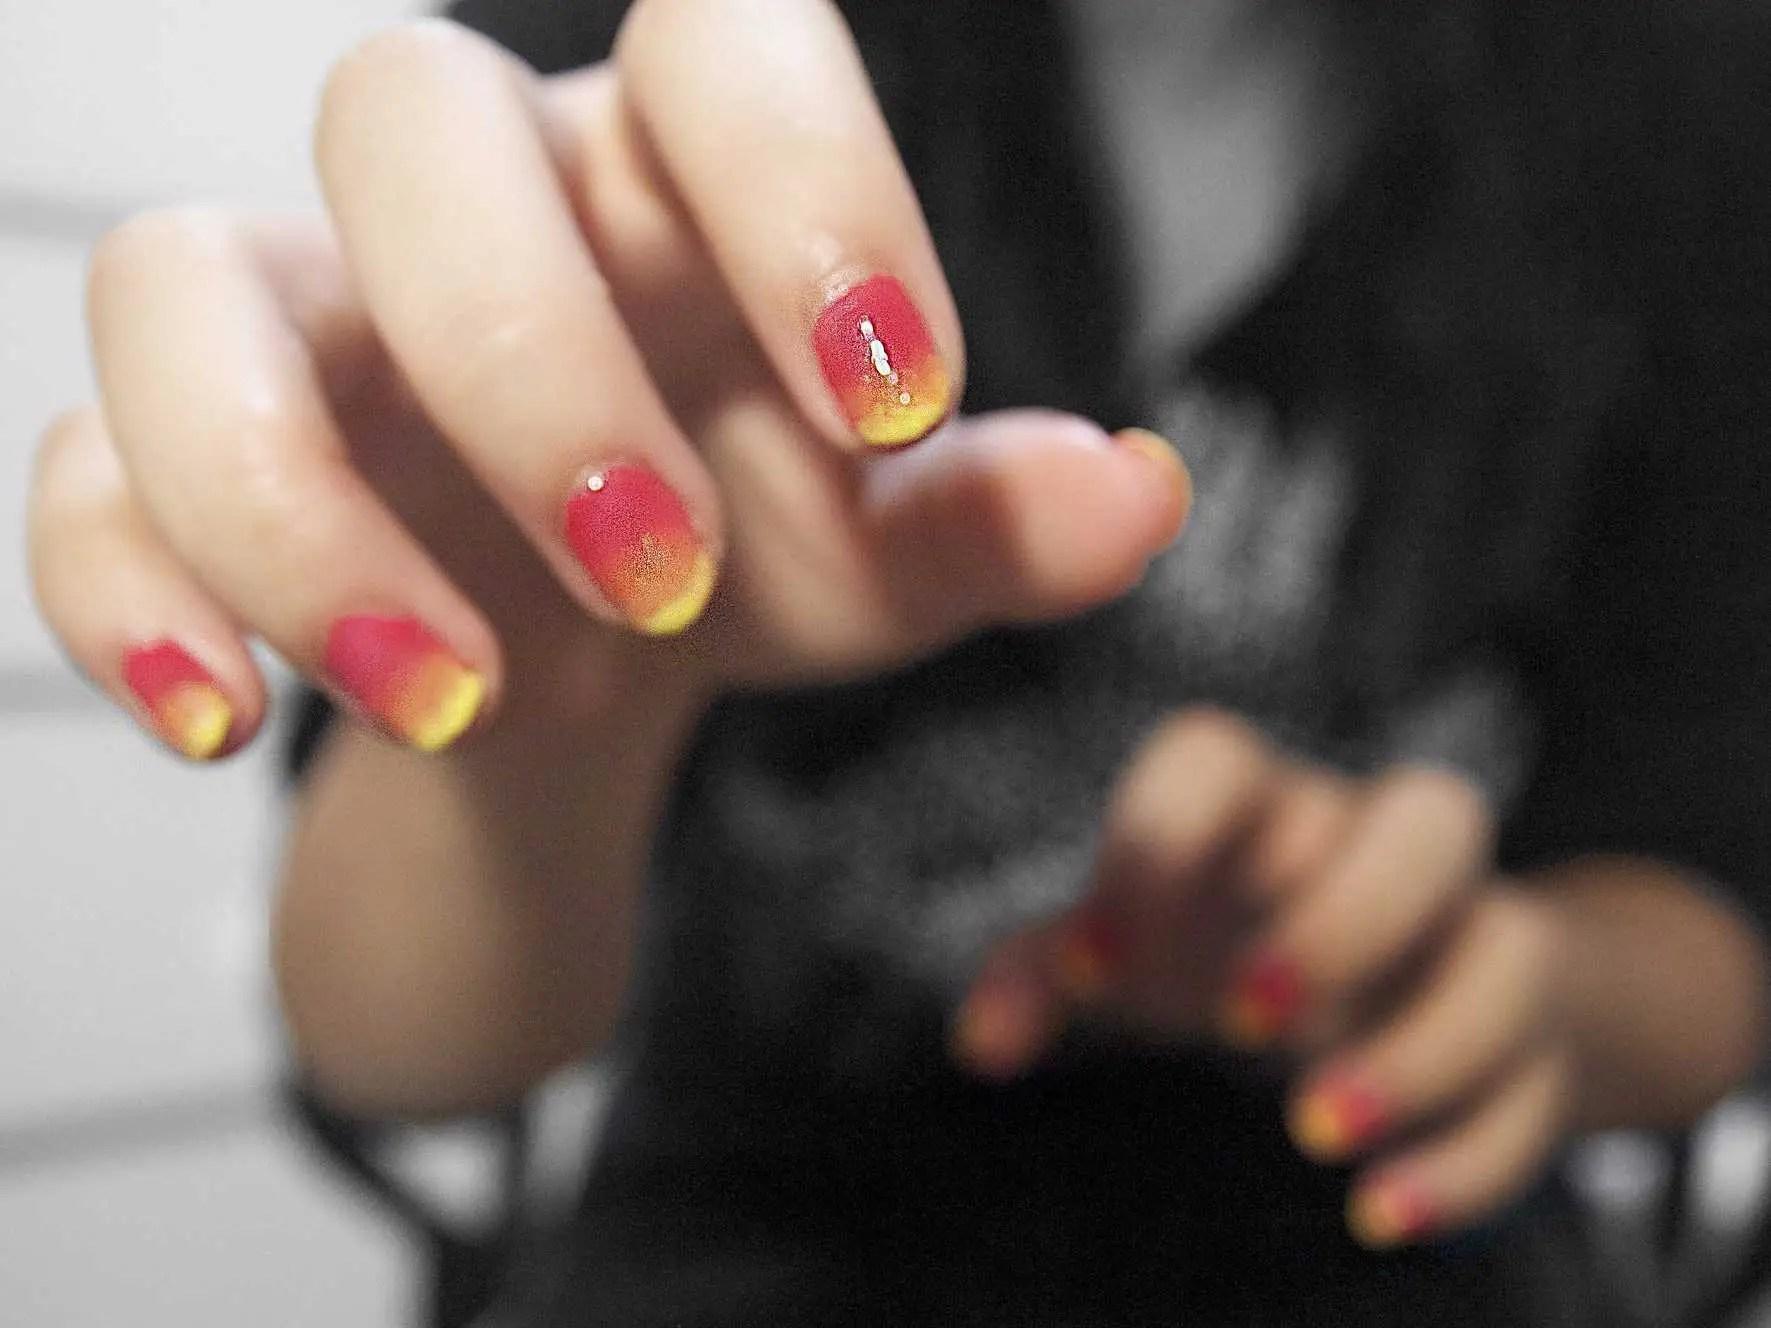 Concrete Flickr Nail Salons